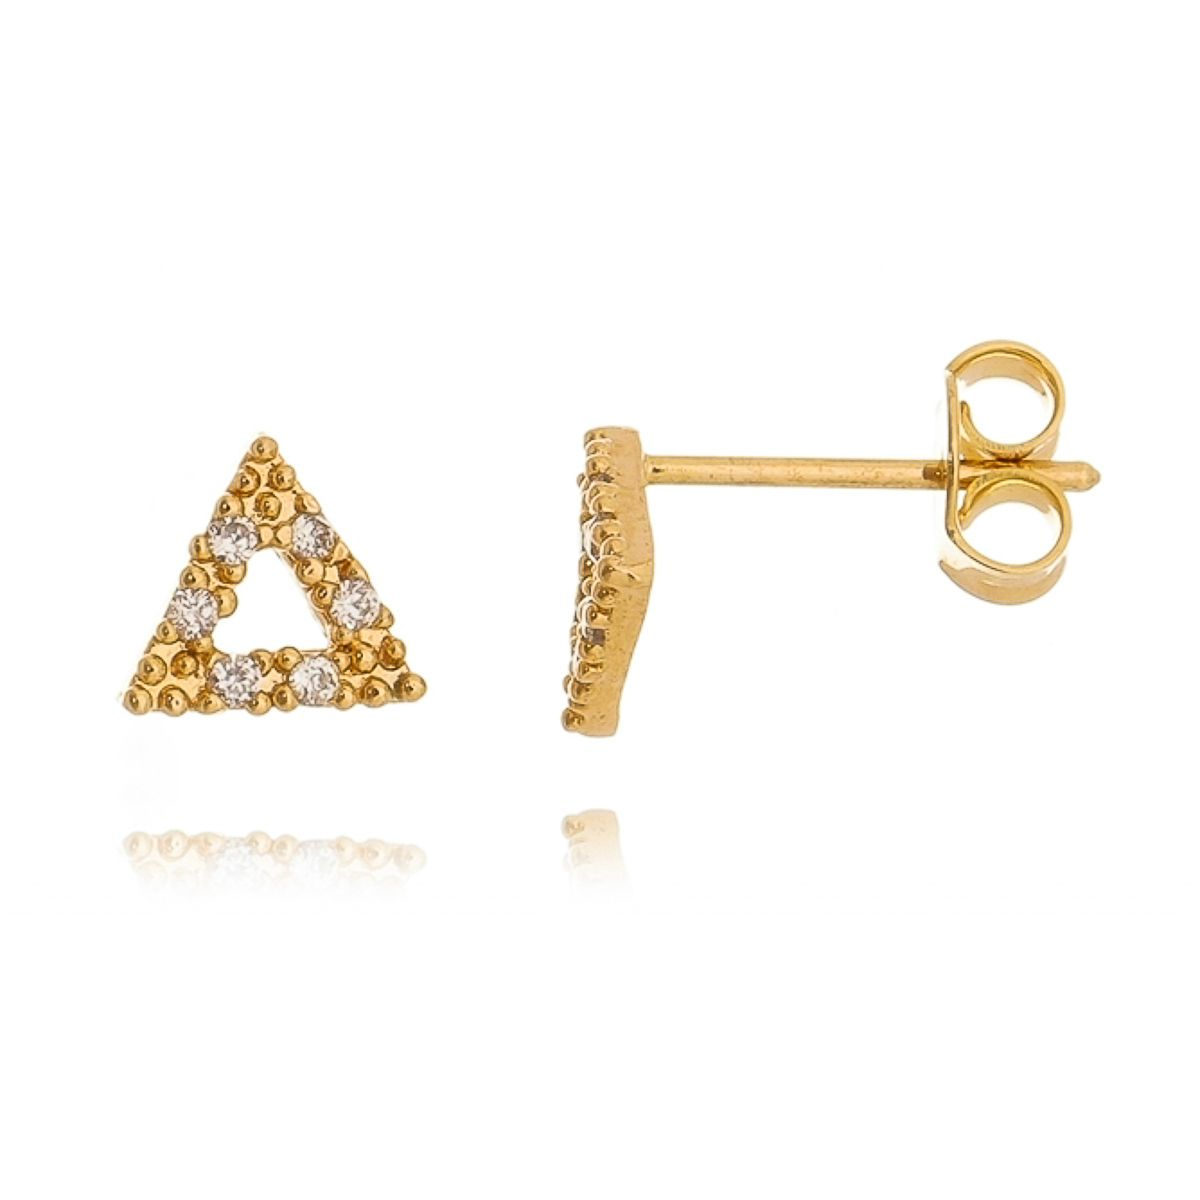 Brinco Triângulo Segundo Furo de Zircônia Cristal Semijoia em Ouro 18K  - SOLOYOU